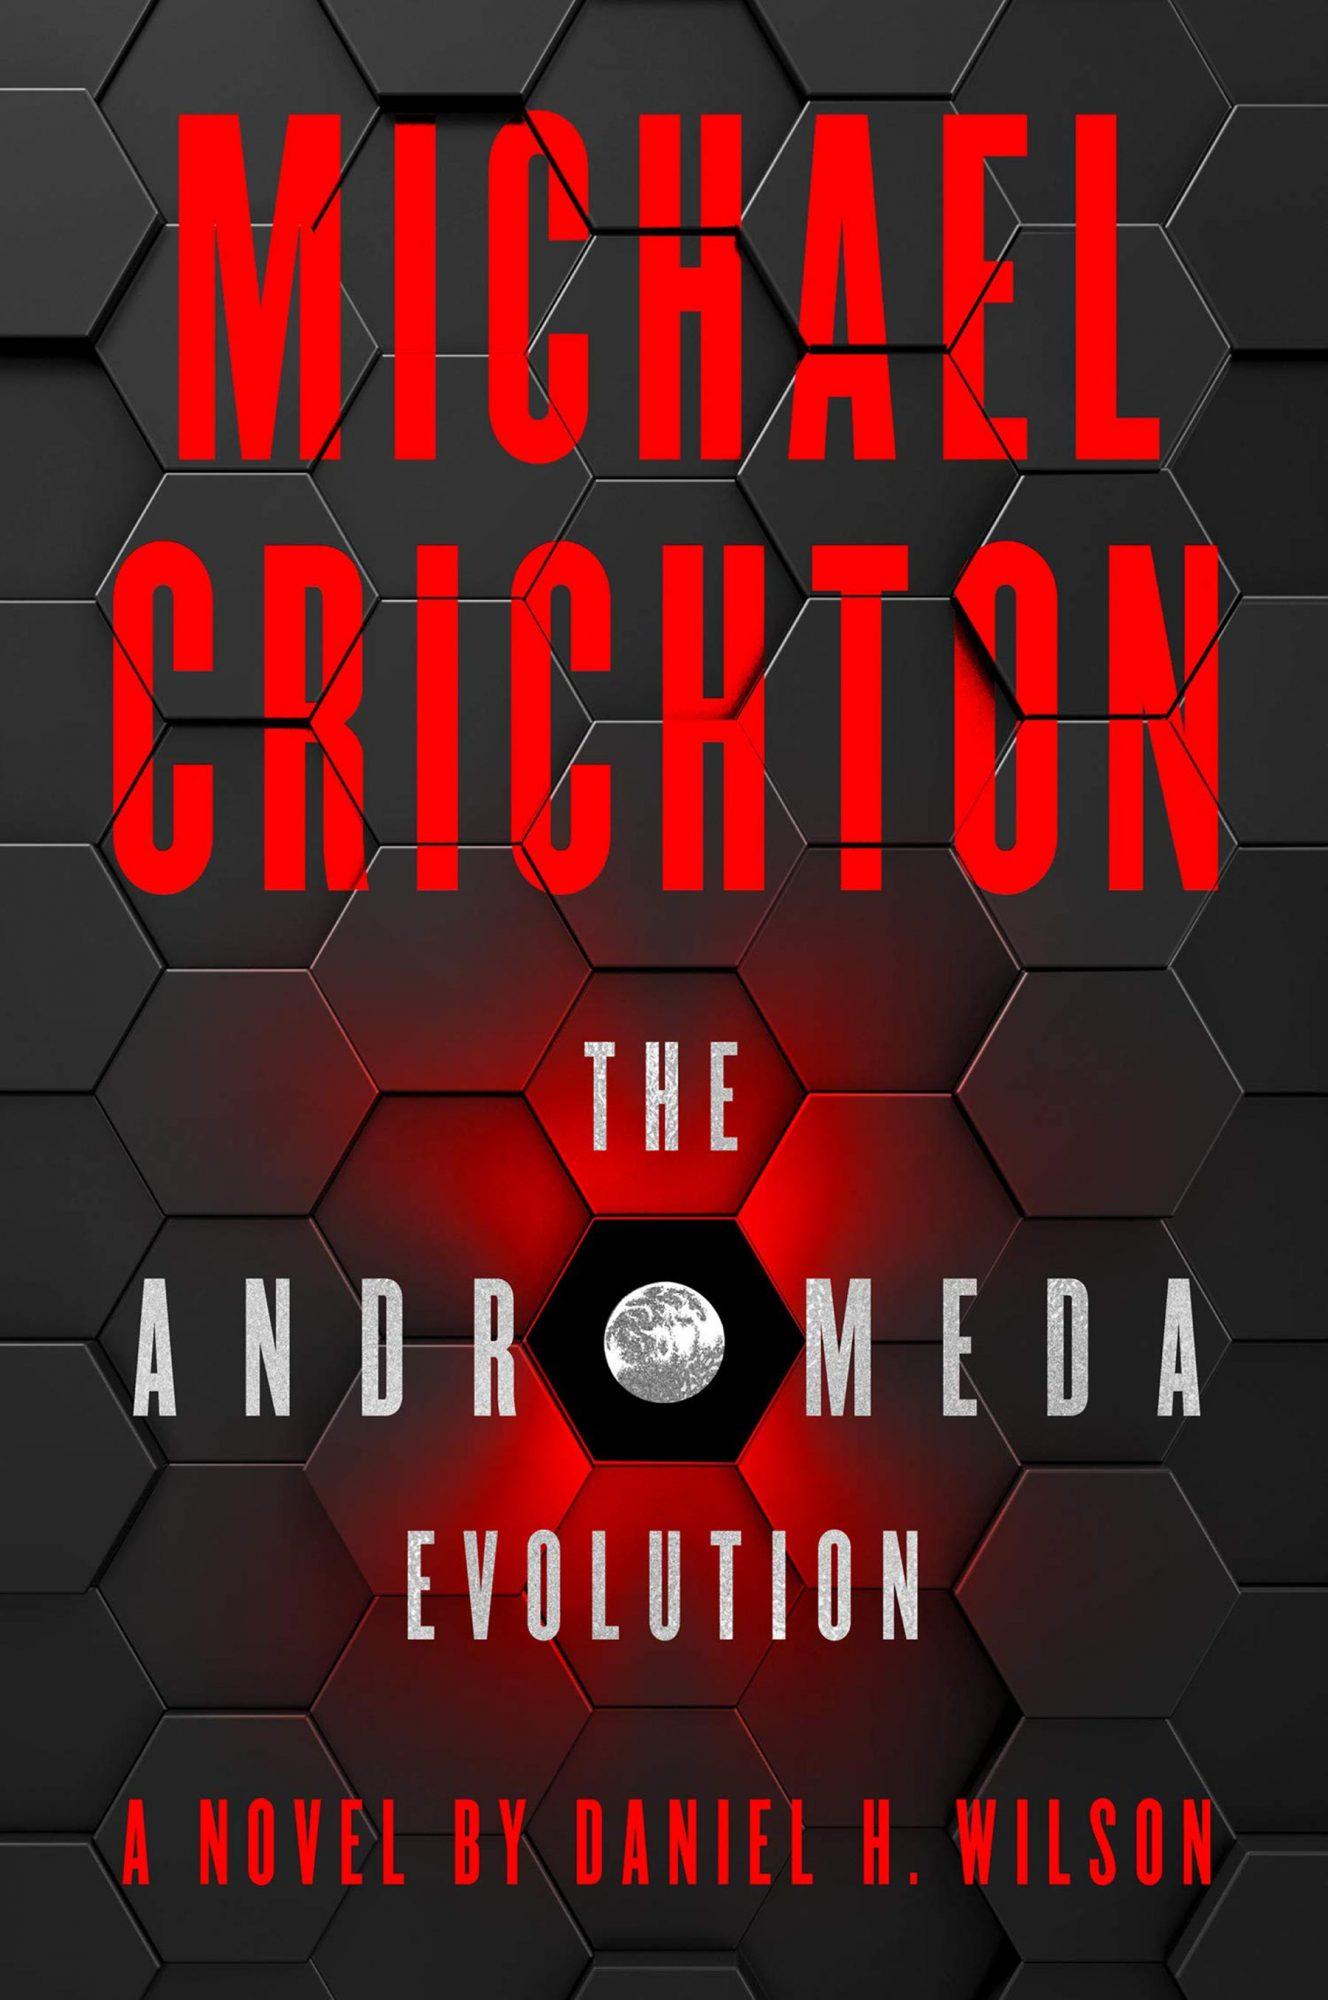 Daniel H. Wilson, The Andromeda EvolutionPublisher: HarperCollins